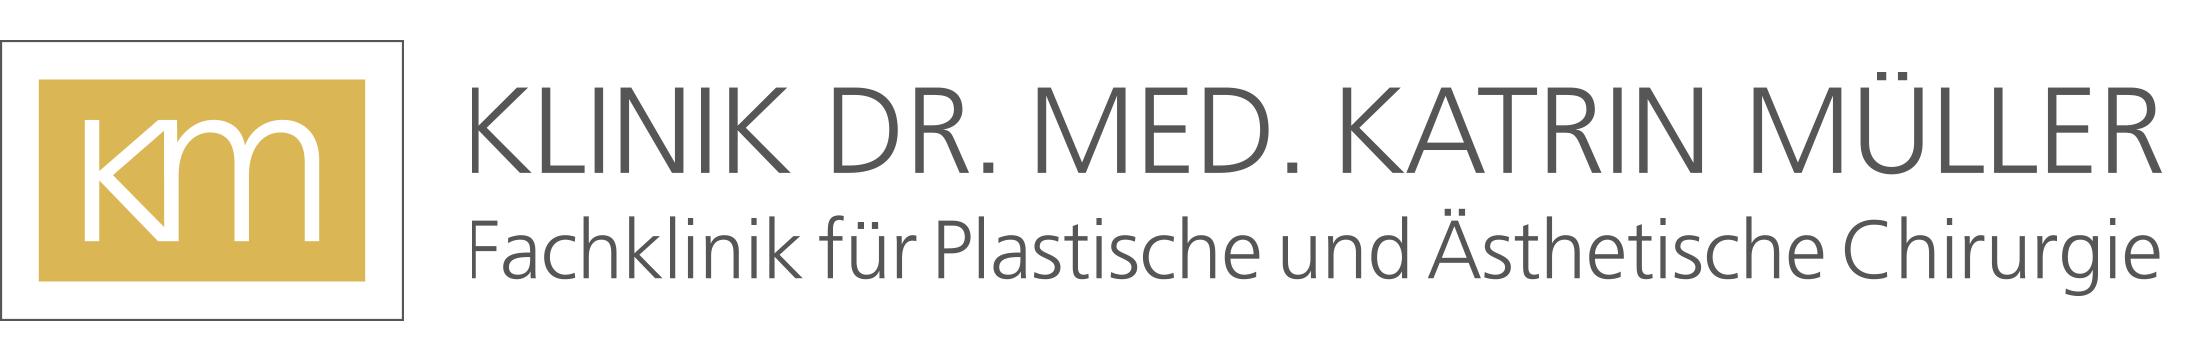 MiraDry Institut Hannover